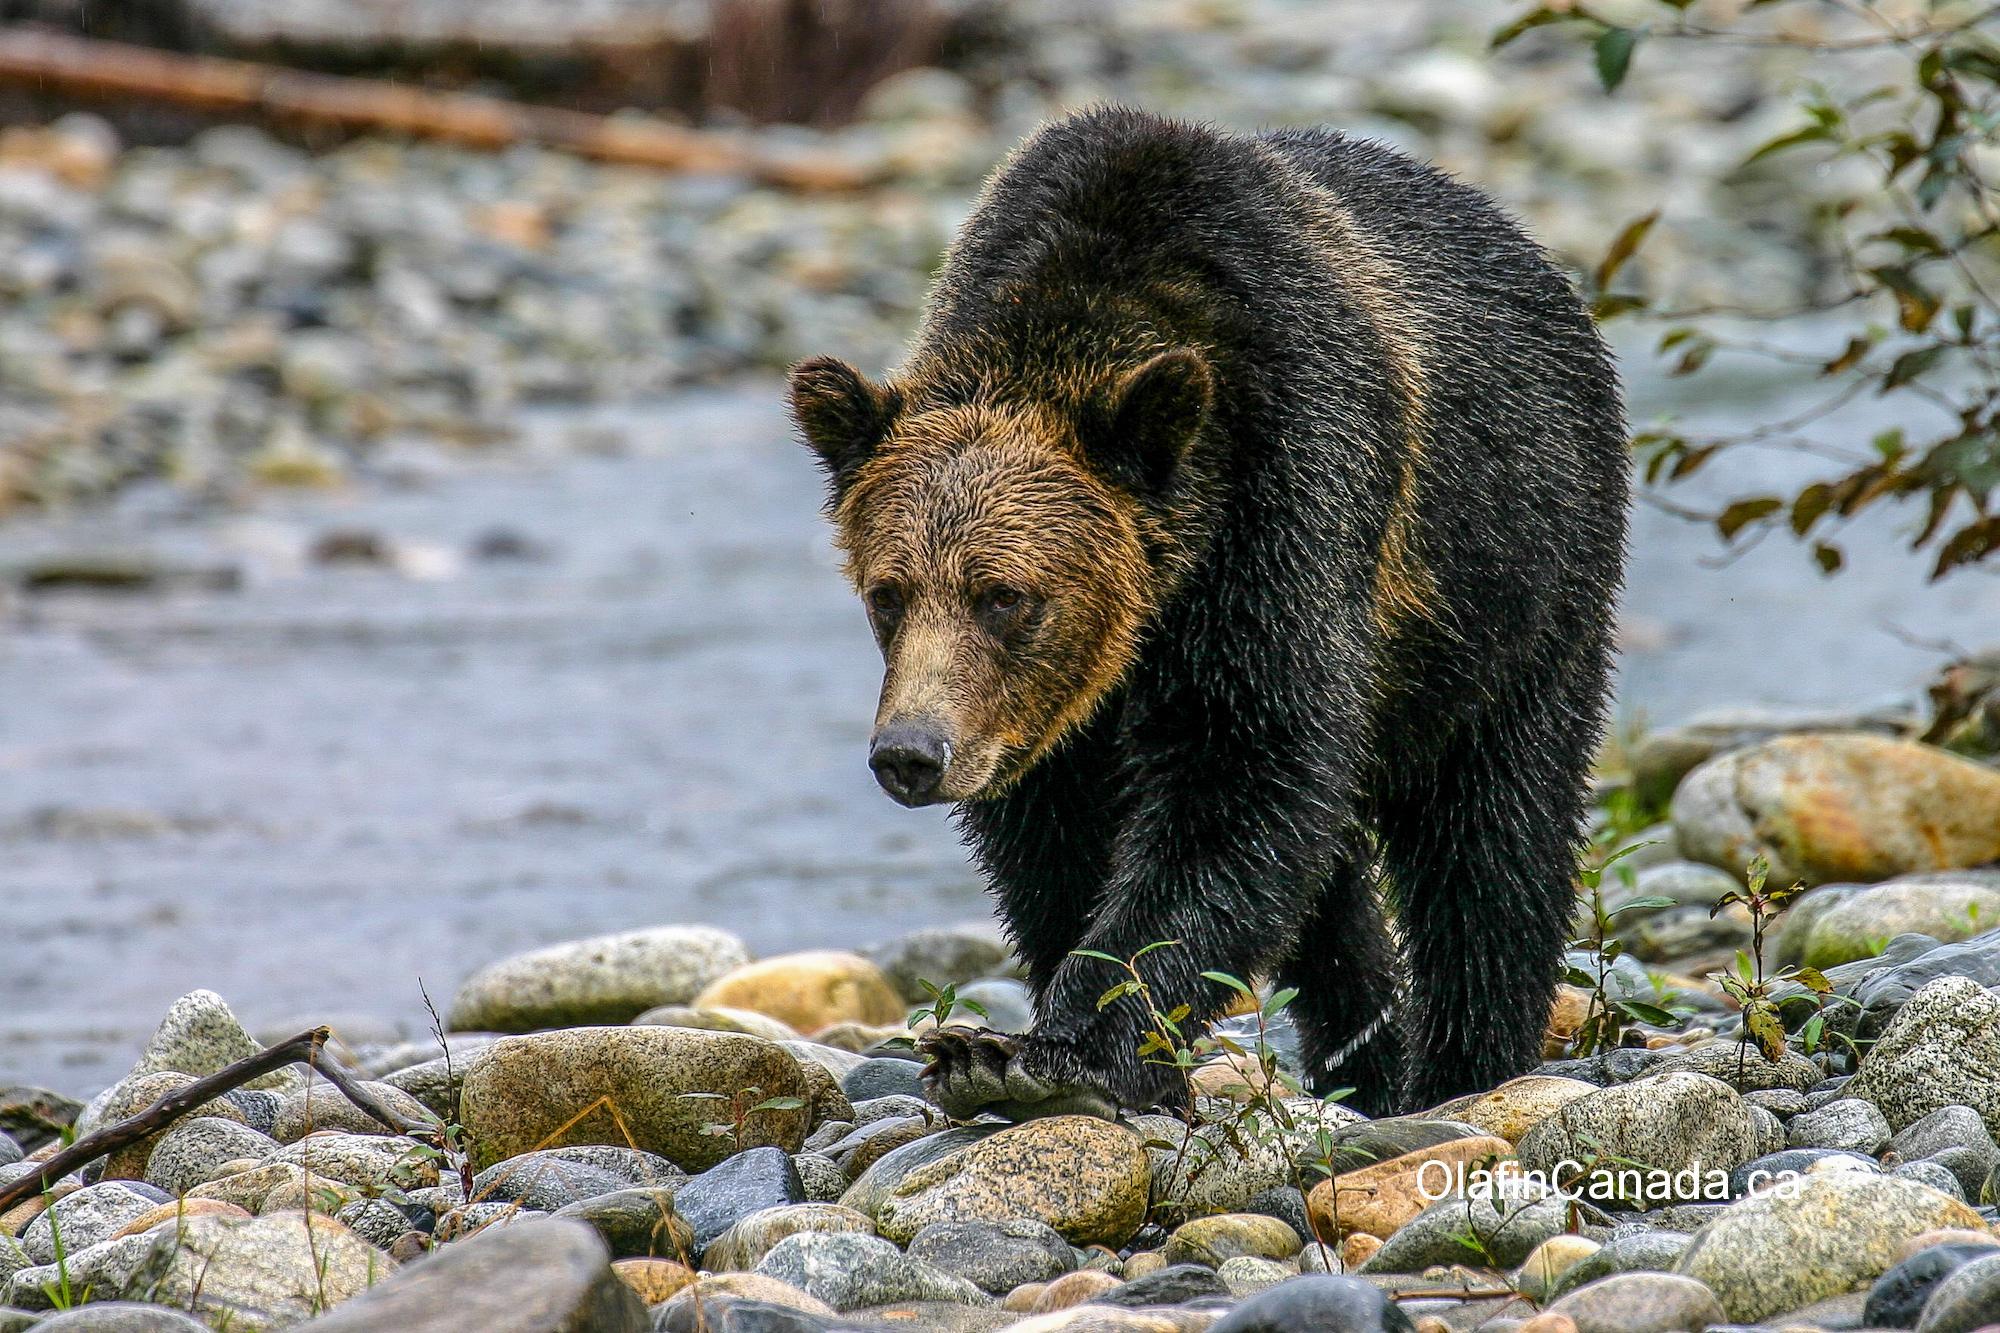 Grizzly bear near Kemano BC #olafincanada #britishcolumbia #discoverbc #kemano #wildlife #grizzlybear